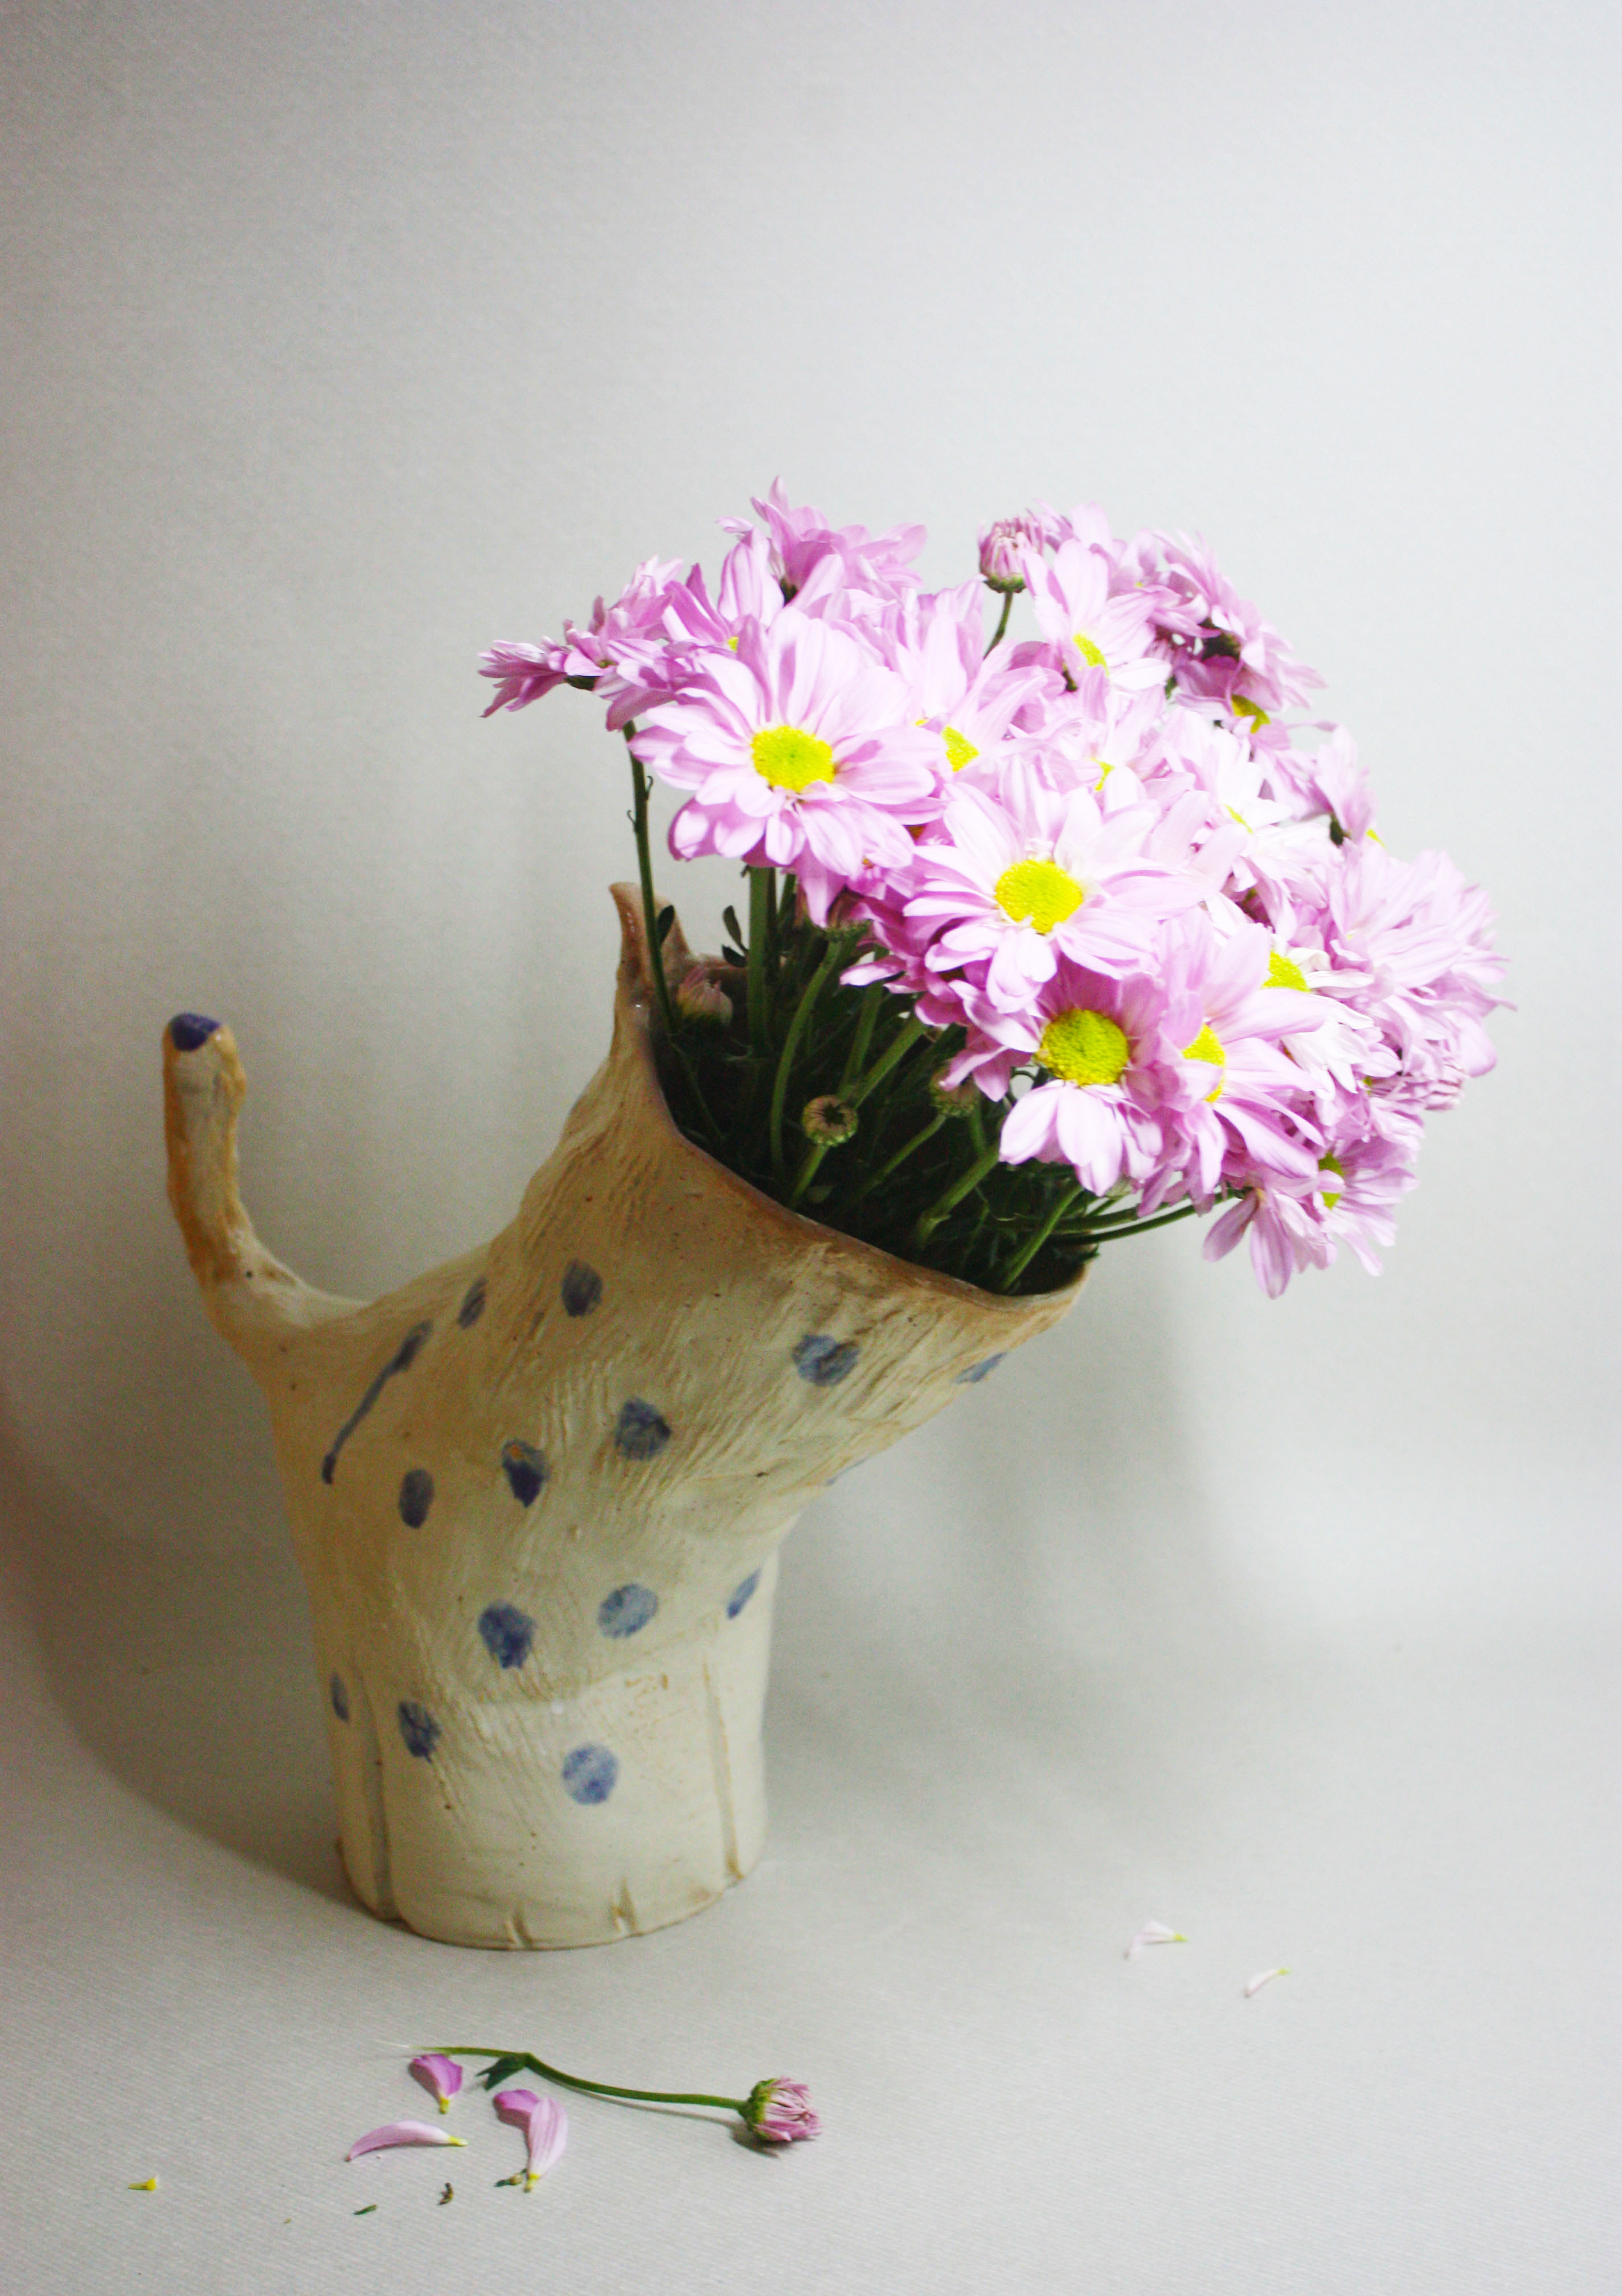 Poof the spotty vase